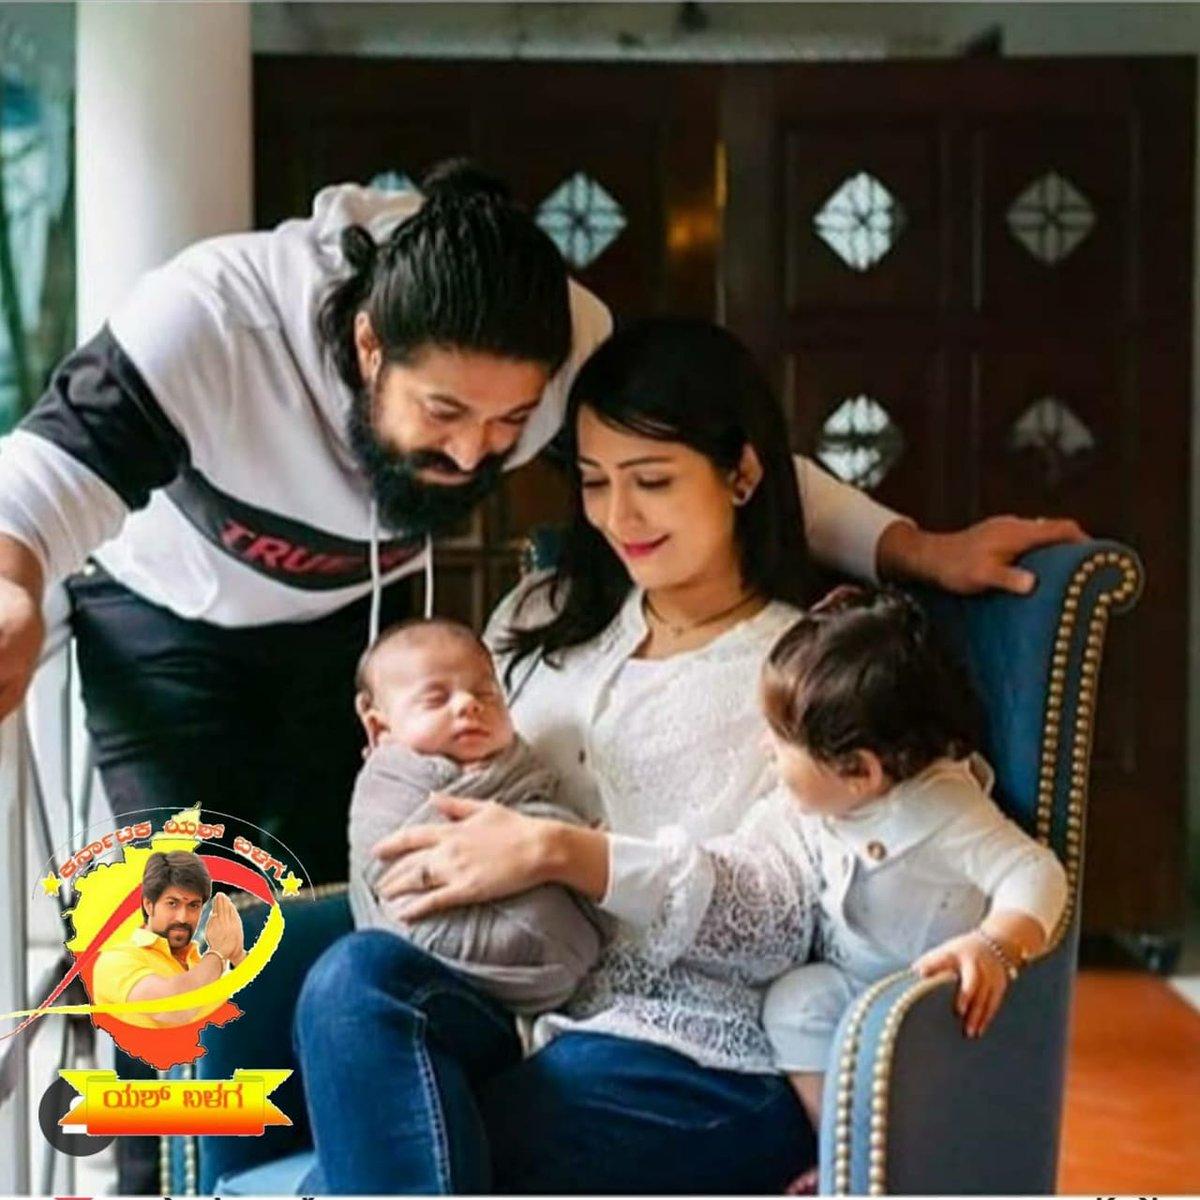 How the sweet itz @thenameisyash #radhikapandit #ayrababy #junioryash #rockingcouple #rockingfamilypic.twitter.com/56AaqWD0NZ